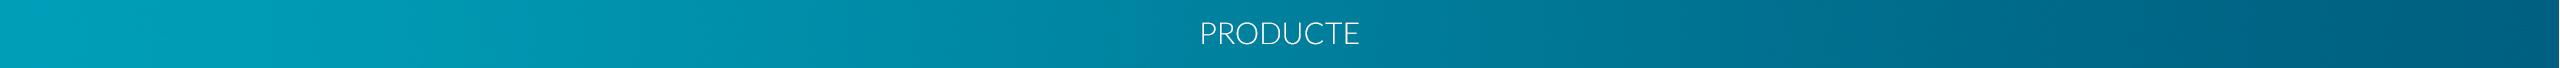 Netsteril títol producte